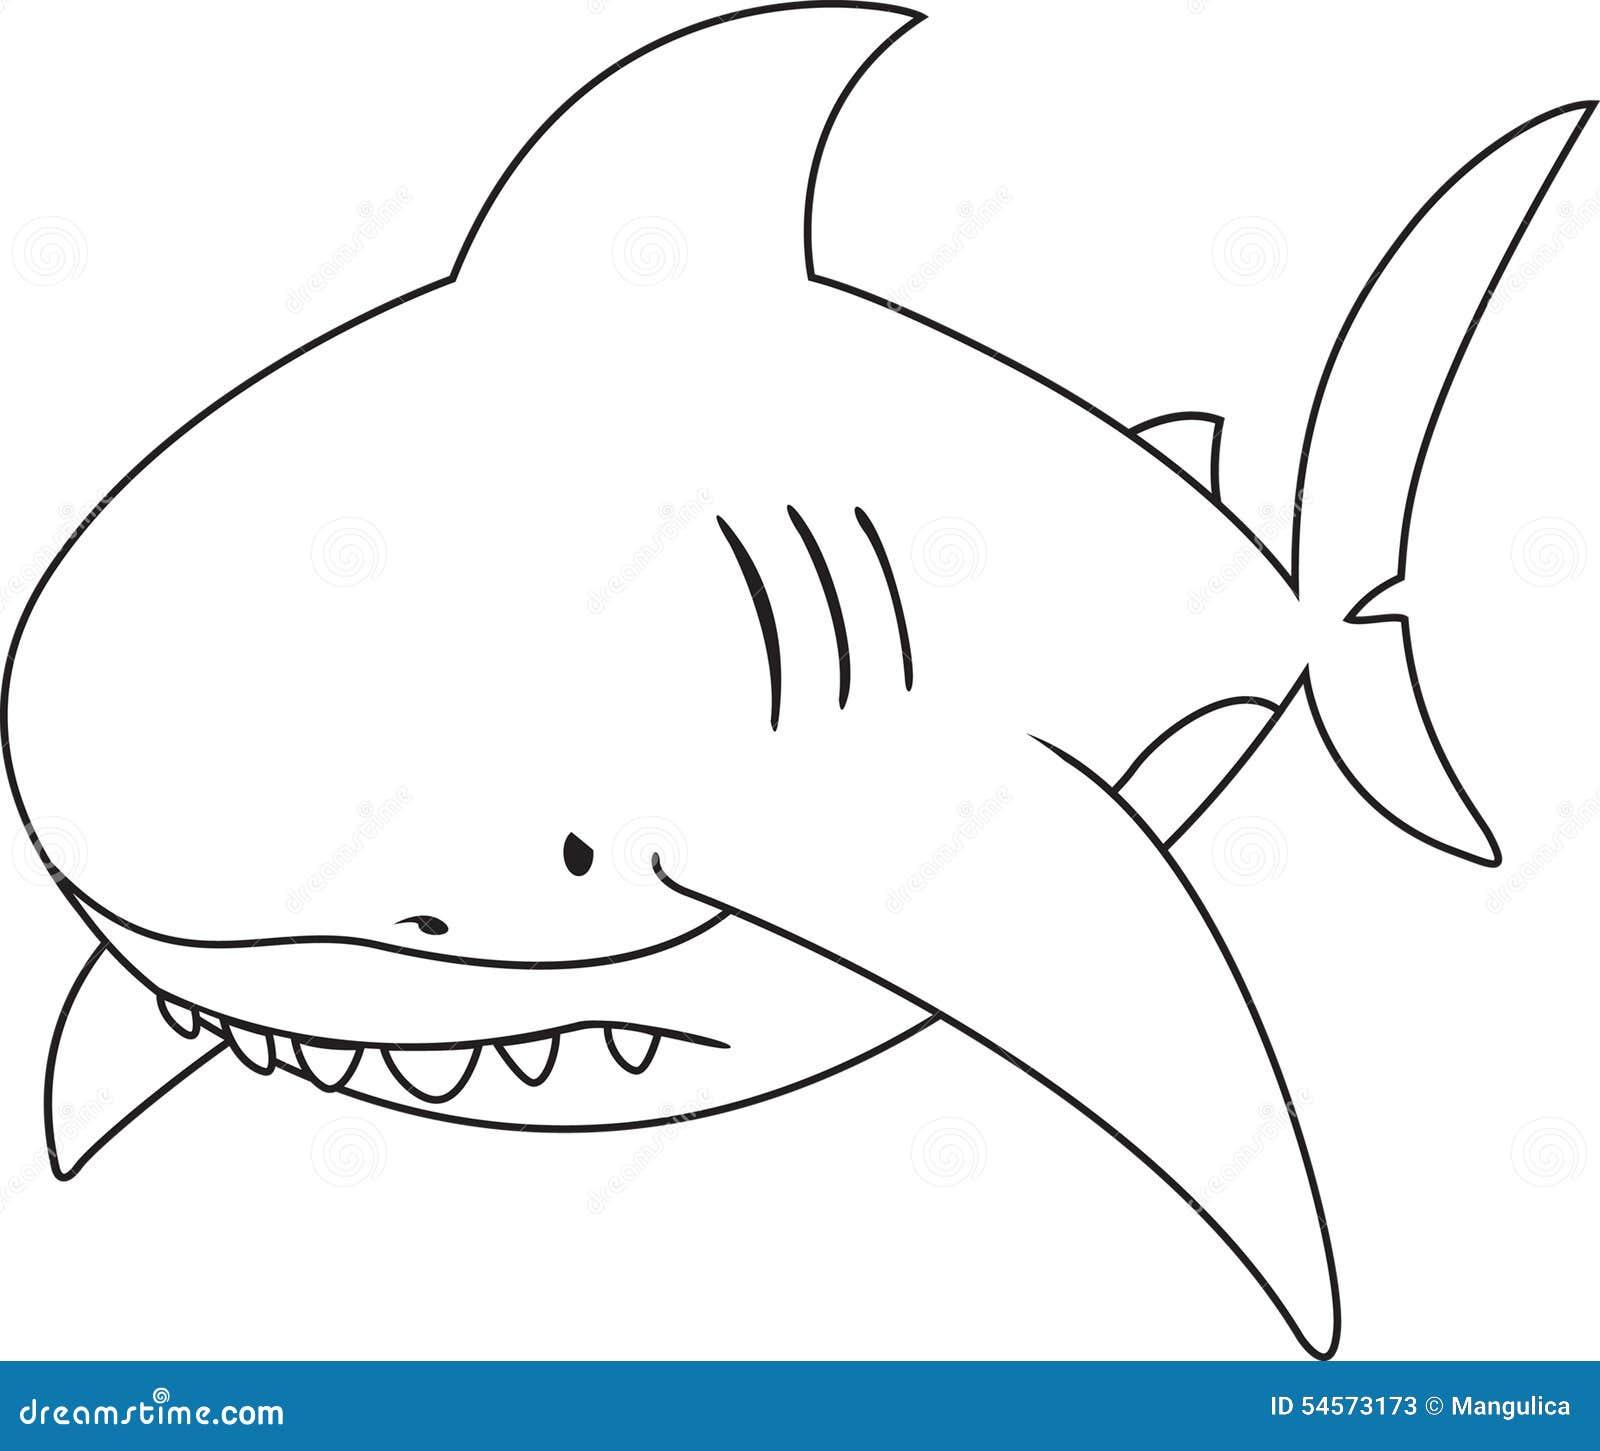 Sad Looking Great White Shark Stock Vector - Illustration of artwork ...